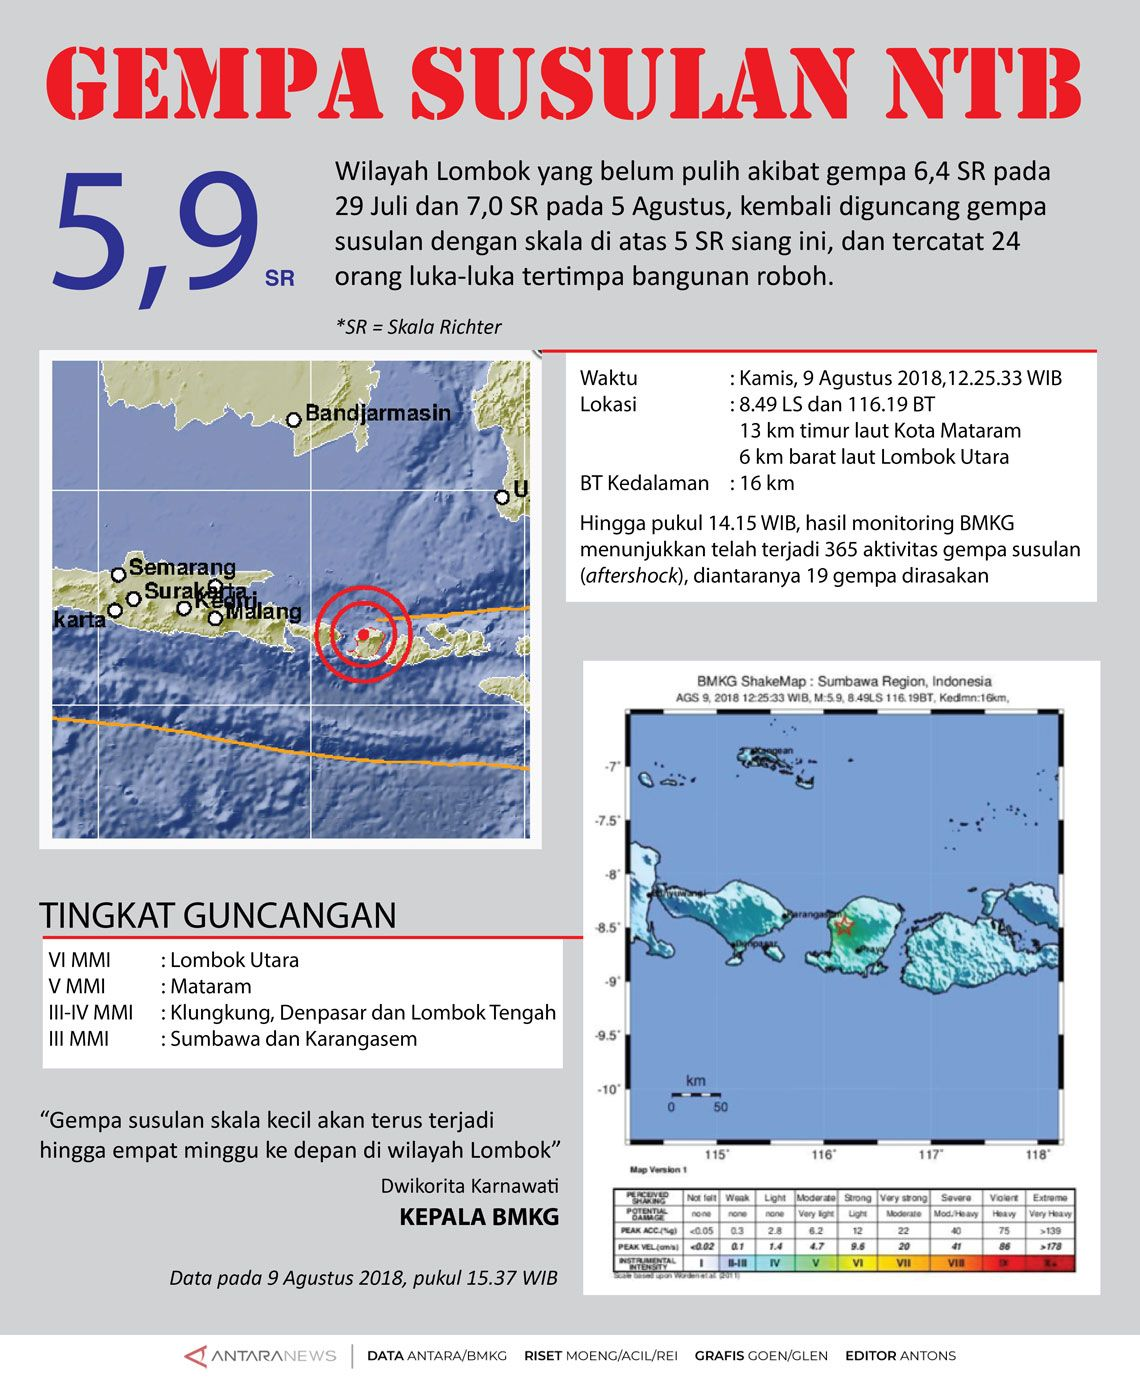 Gempa Susulan 5,9 SR